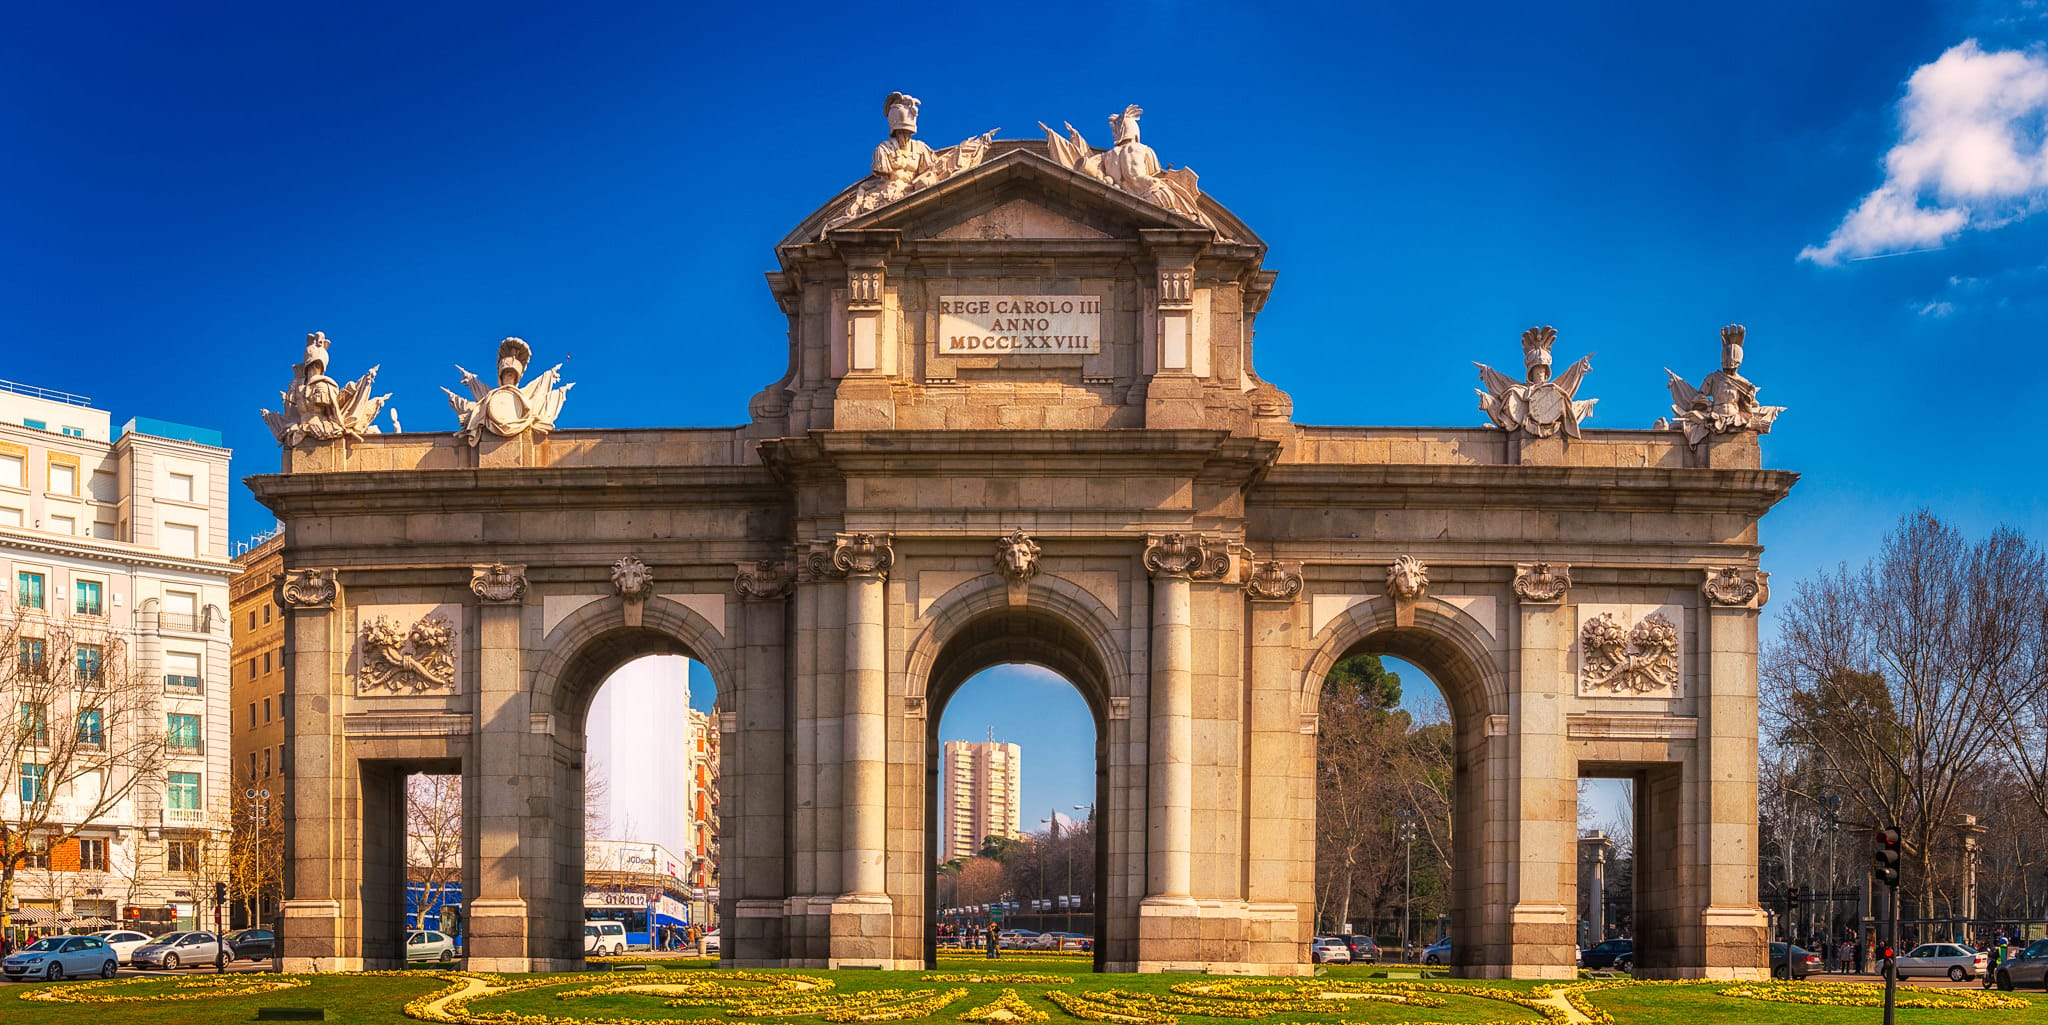 Puerta De Alcal Madrid Spain Sumfinity